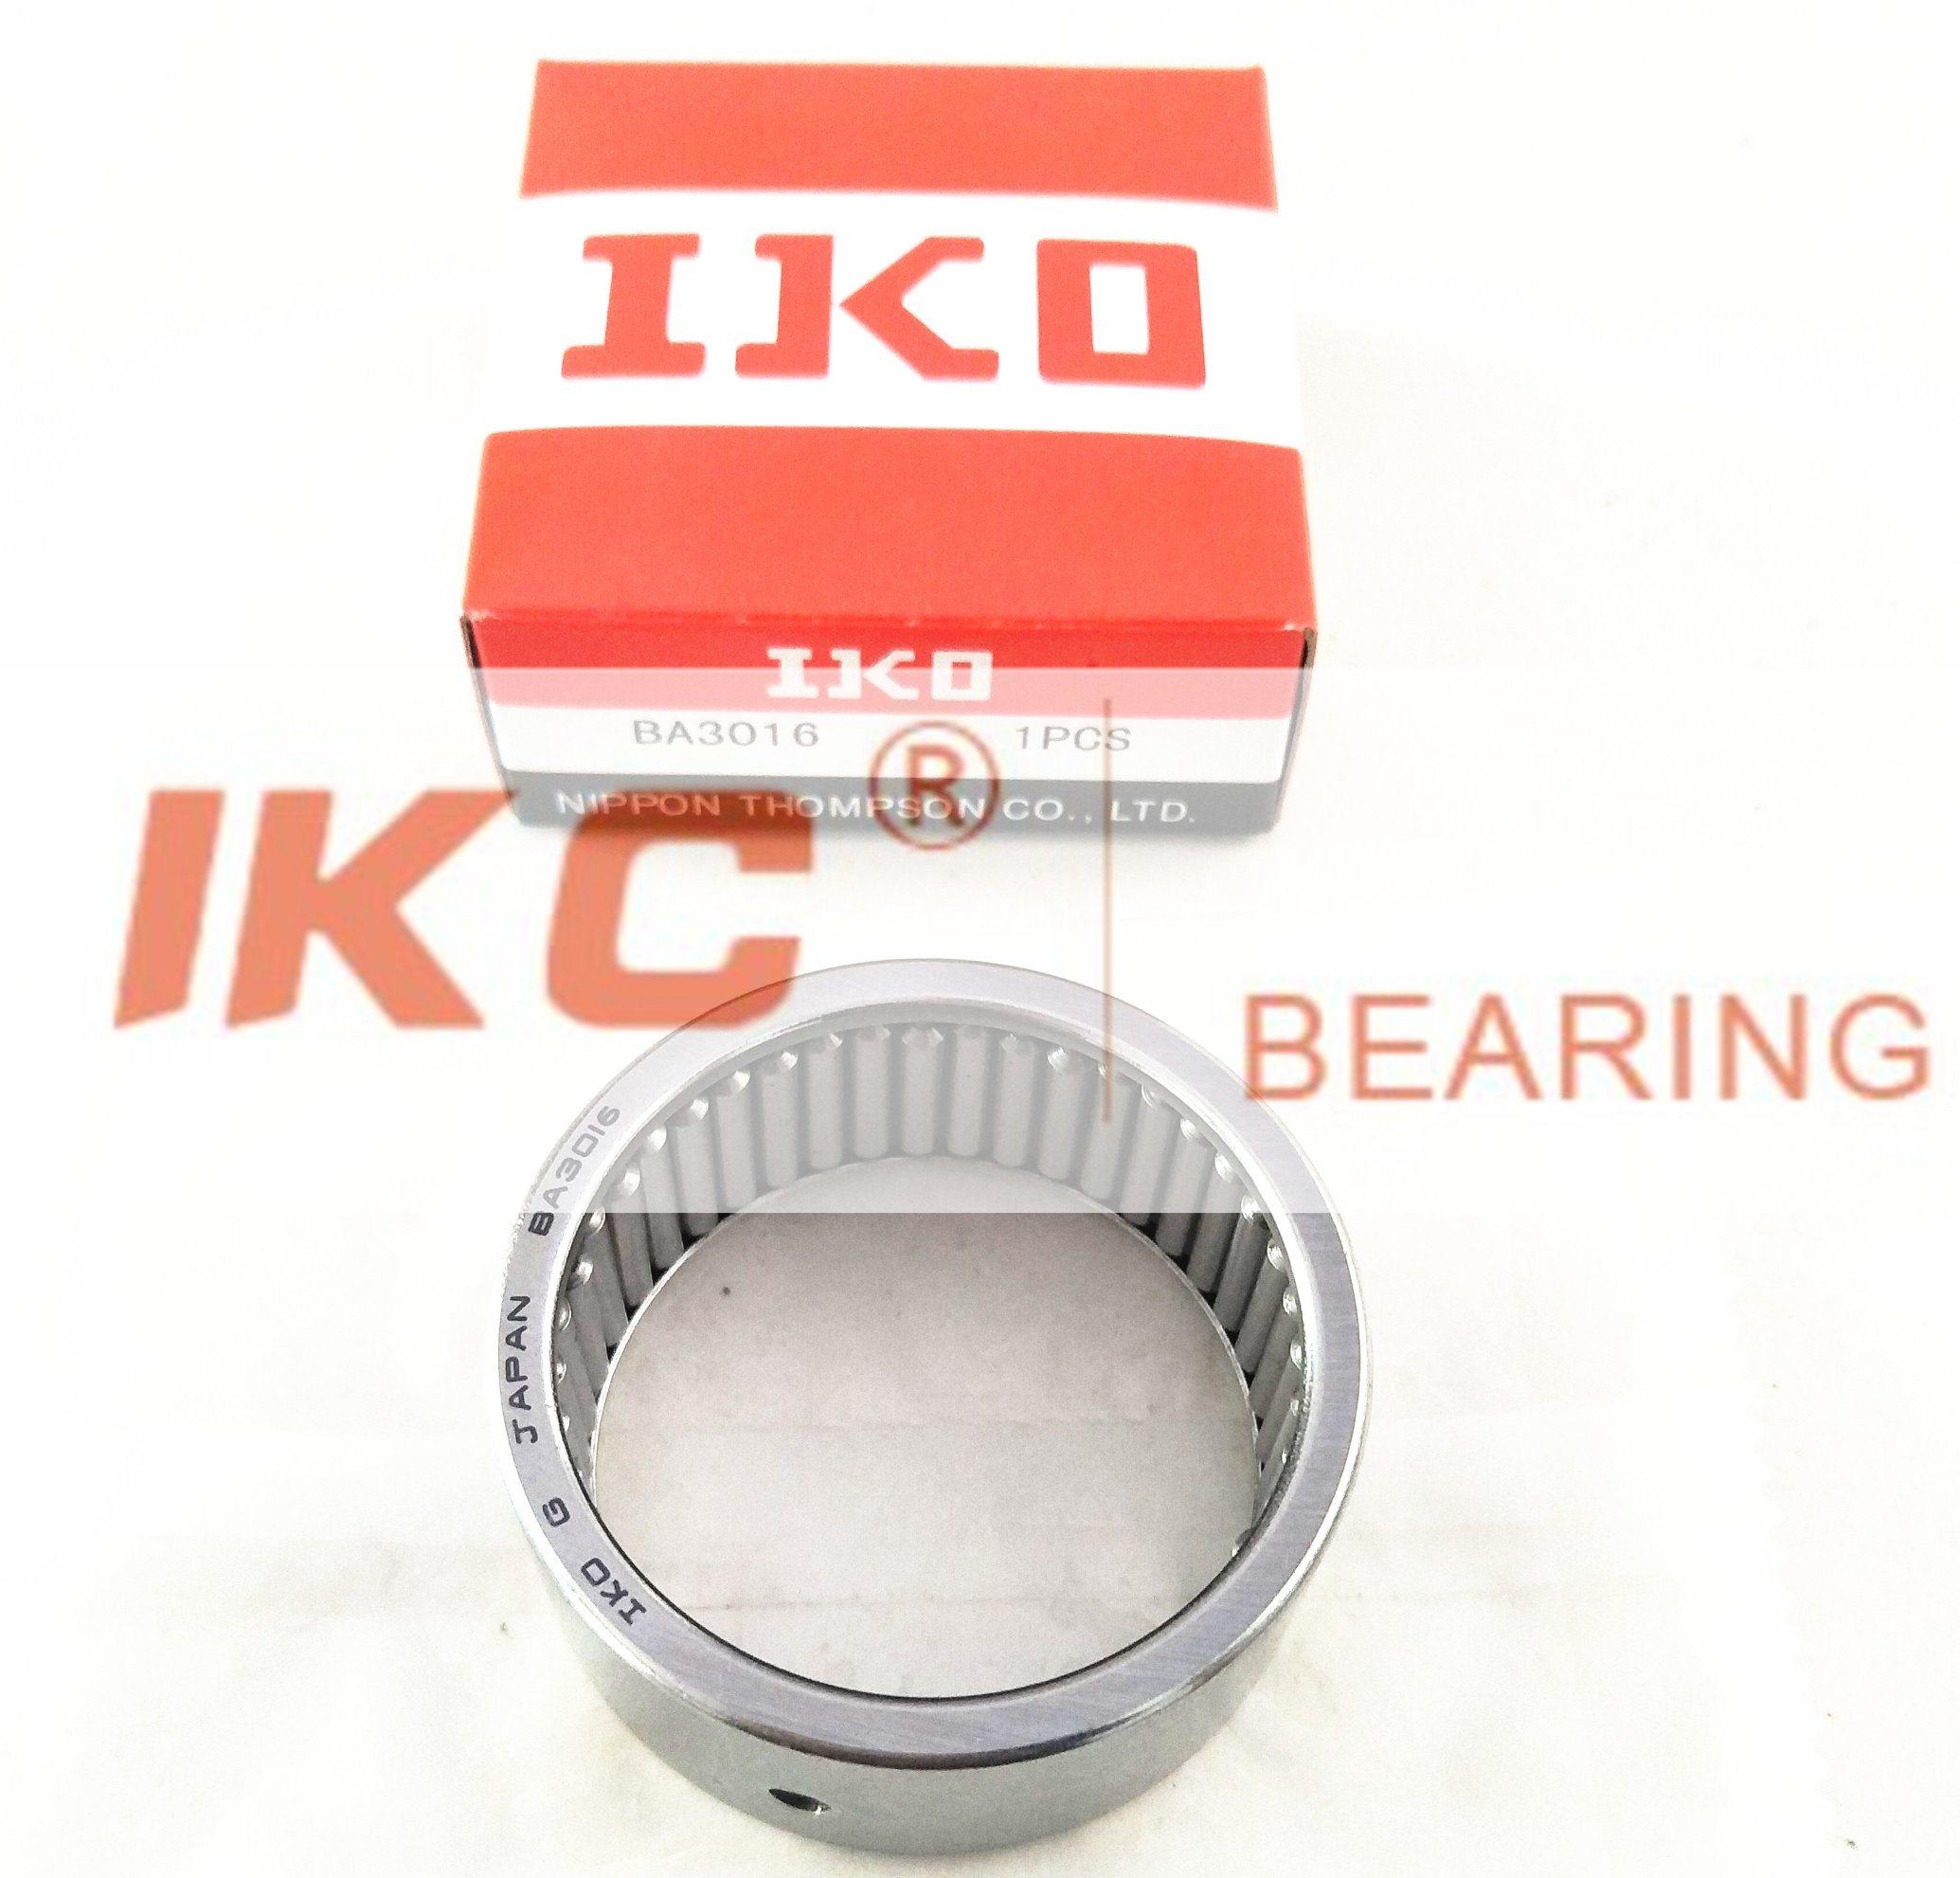 1 pcs KOYO B-44 needle Bearing sealed new free shipping made in Japan